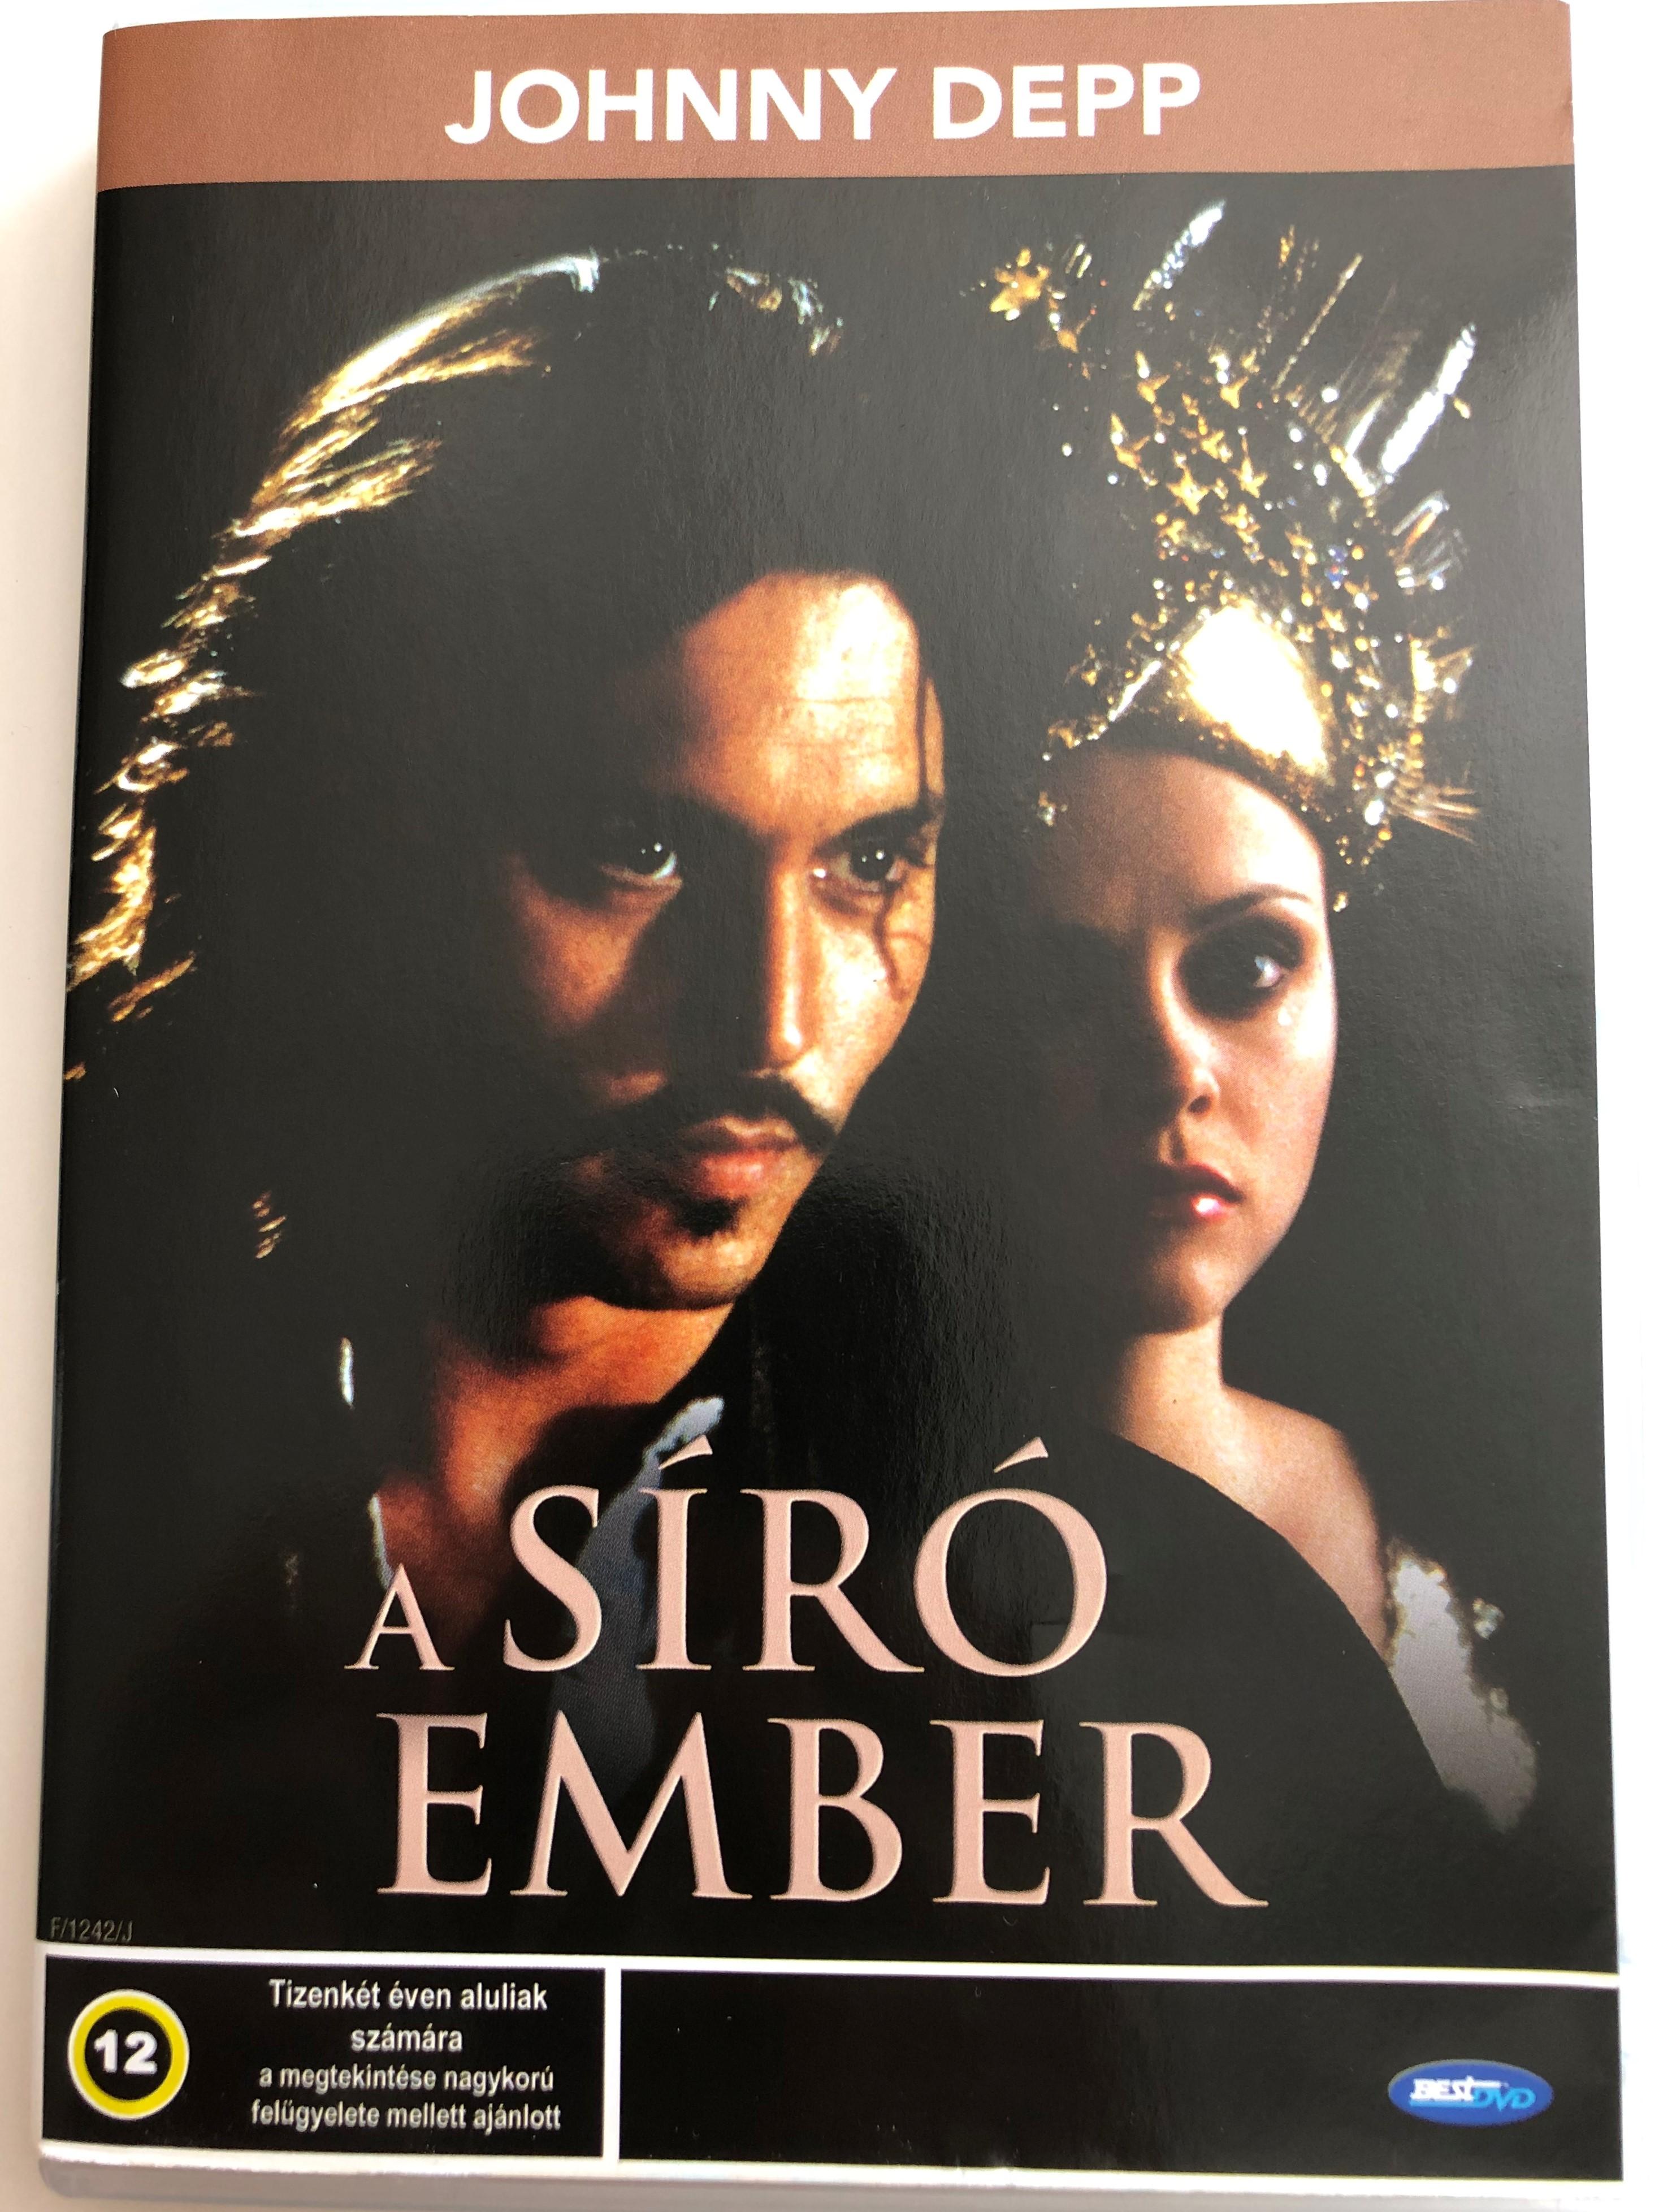 the-man-who-cried-dvd-2000-a-s-r-ember-directed-by-sally-potter-starring-christina-ricci-cate-blanchett-john-turturro-johnny-depp-harry-dean-stanton-1-.jpg